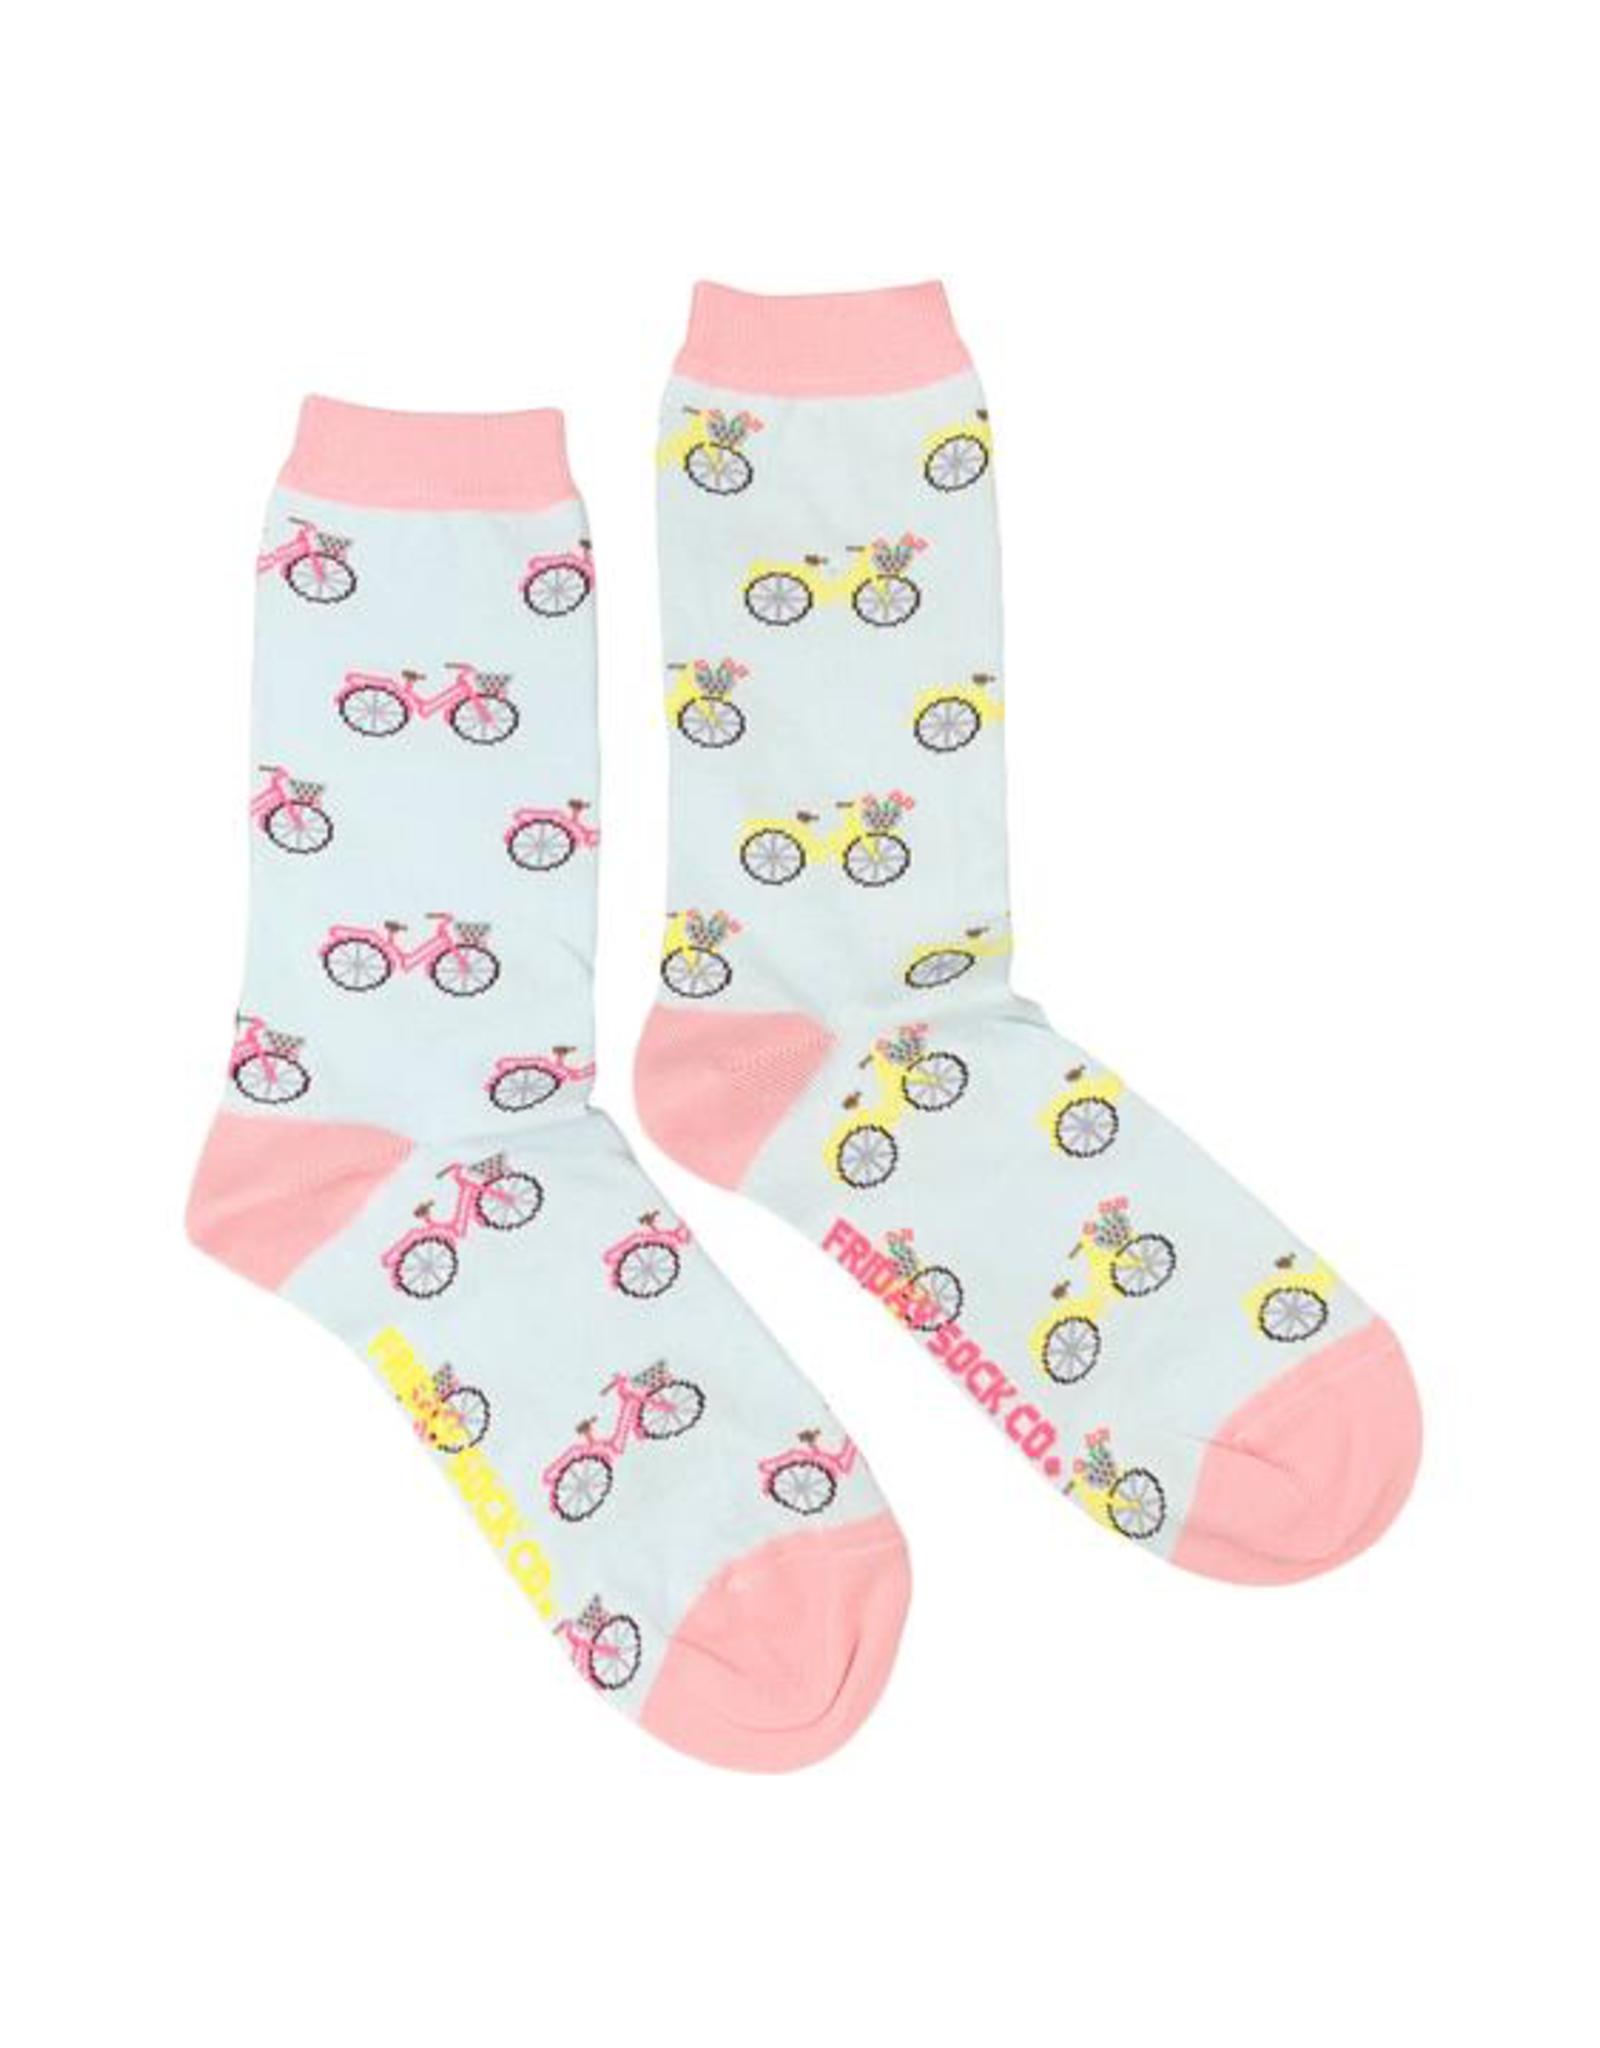 Friday Sock Co Friday Sock Co Pink And Yellow Bike Socks